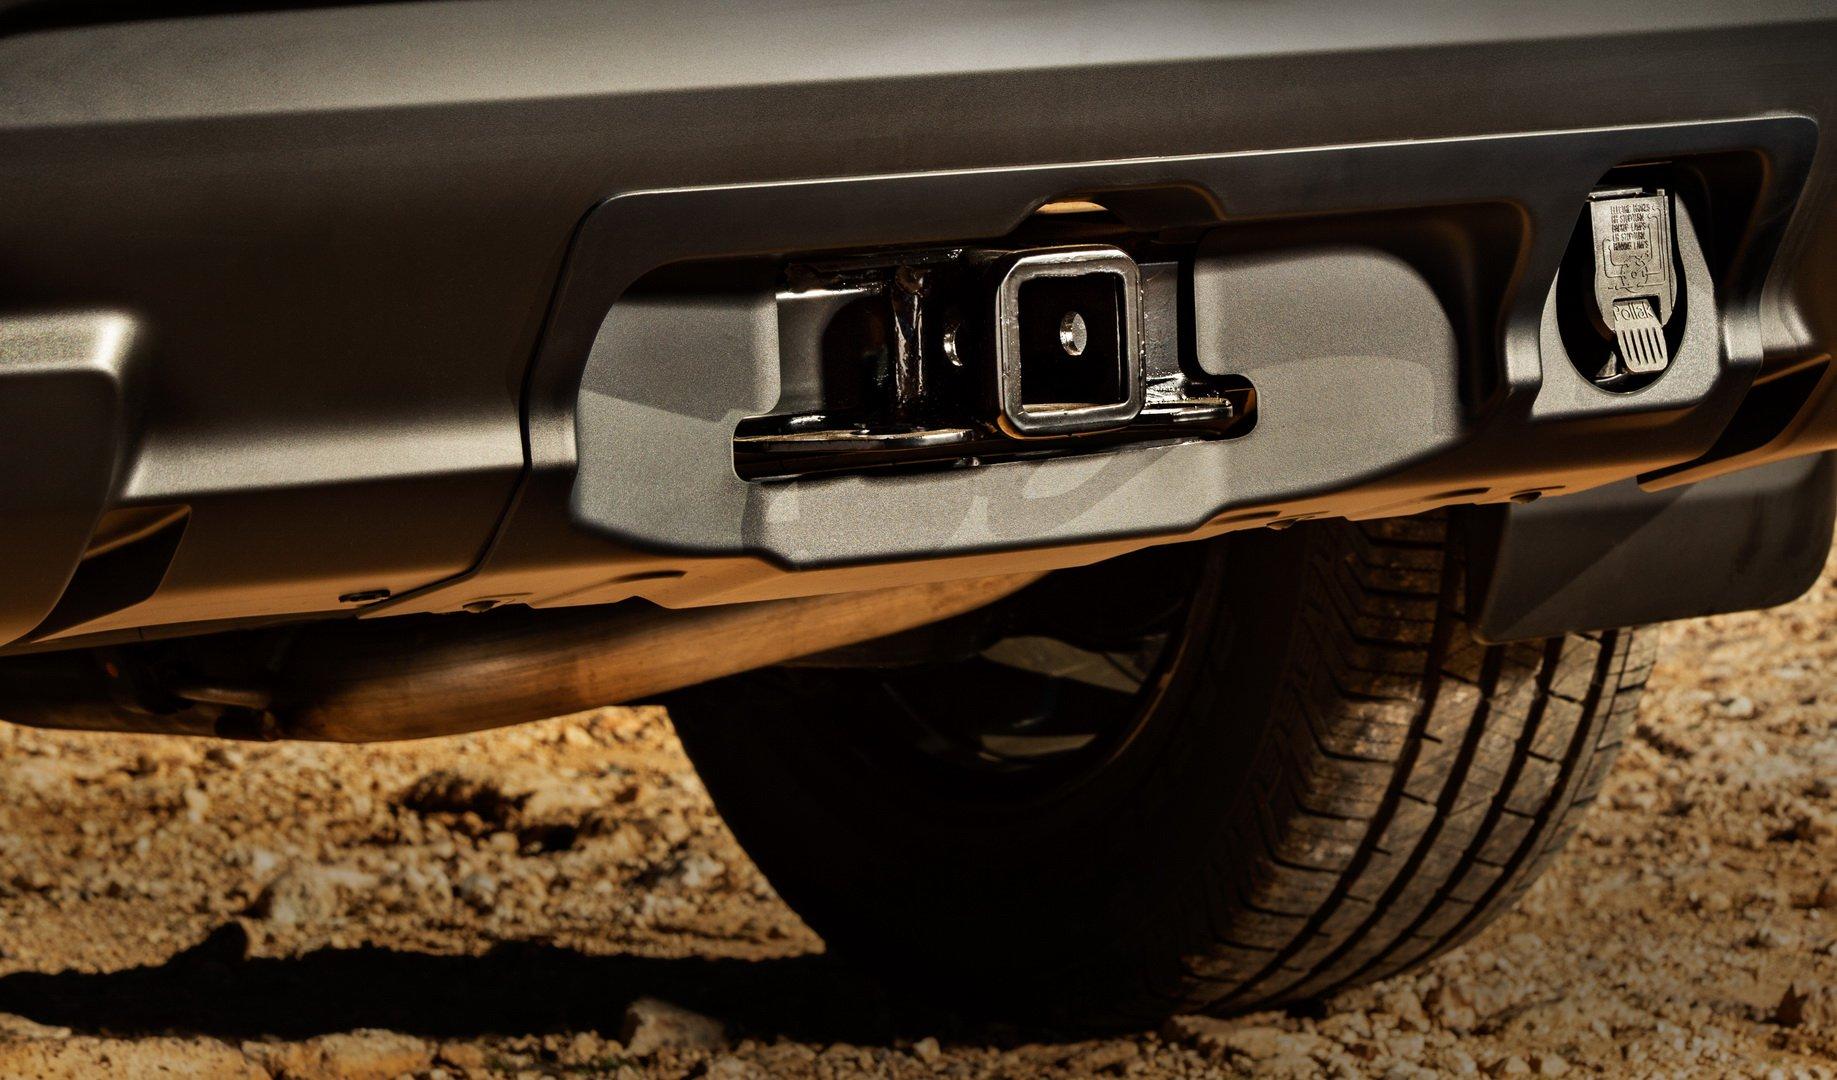 Nissan Pathfinder Rock Creek Edition 2019 (10)